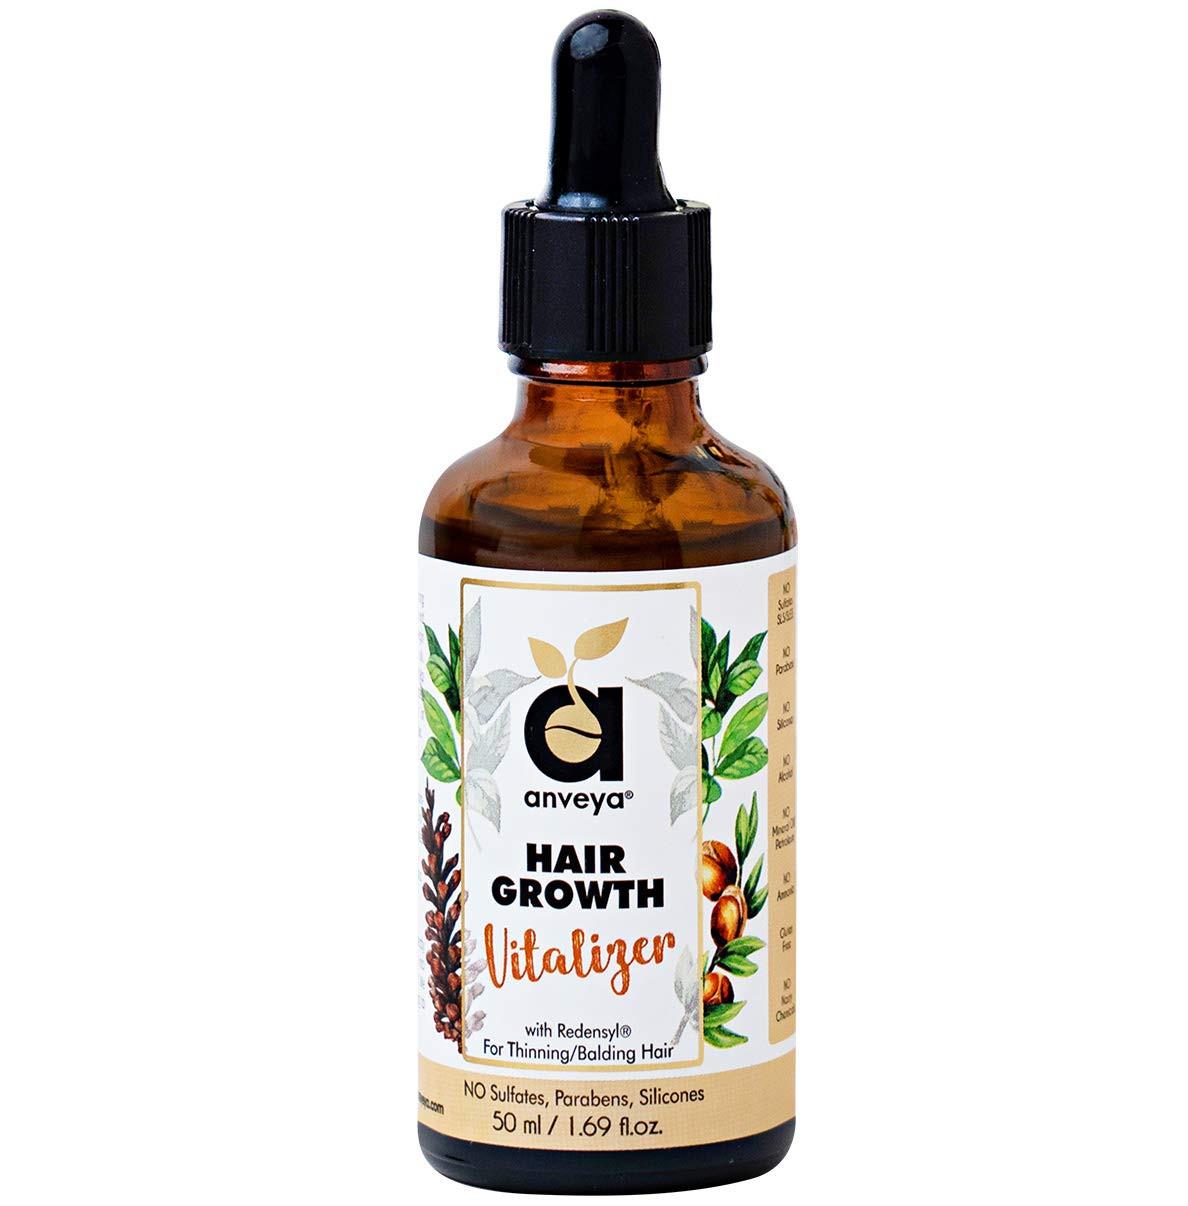 Anveya Hair Growth Vitalizer Serum, with Redensyl for Hair Fall - Men & Women